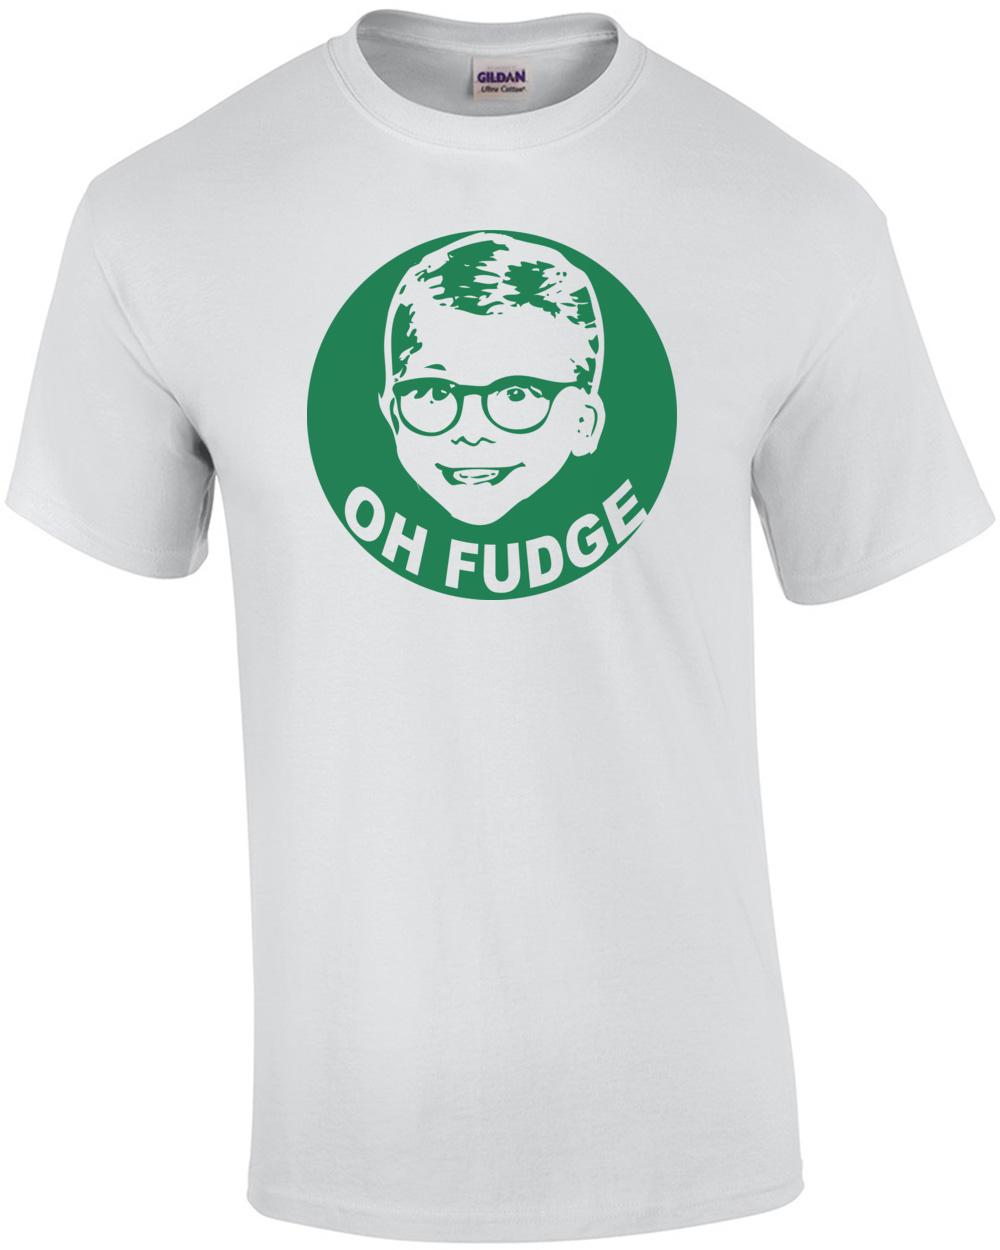 Oh Fudge - A Christmas Story Shirt